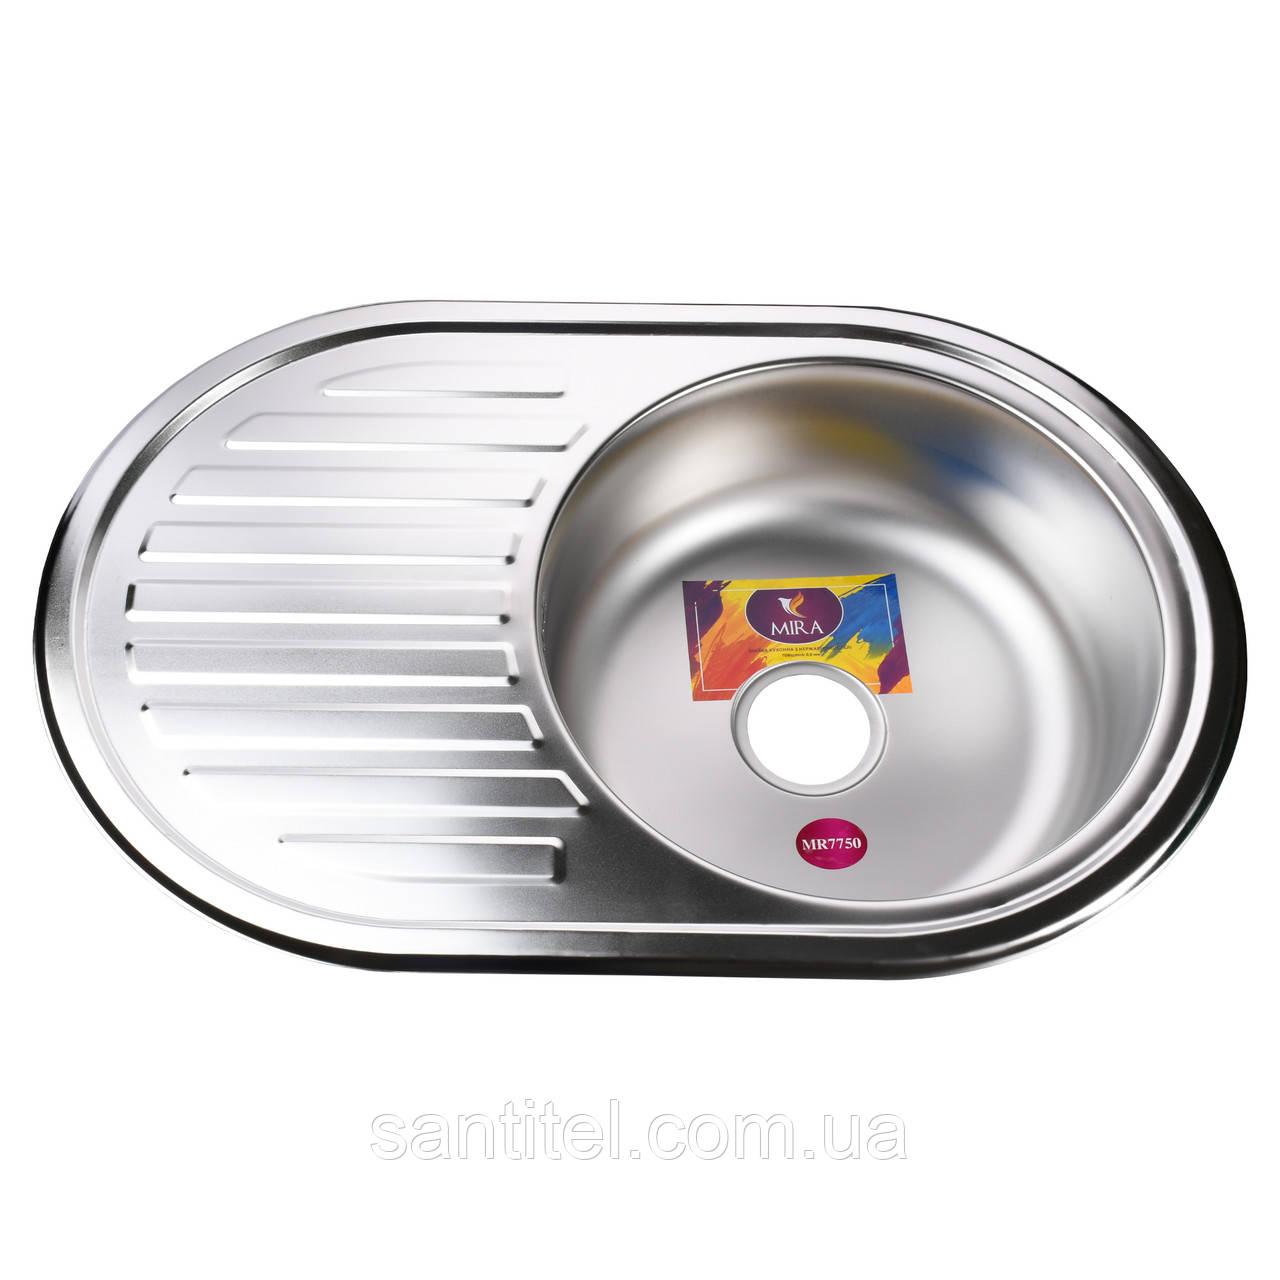 Мойка кухонная Mira MR 7750 E Satin